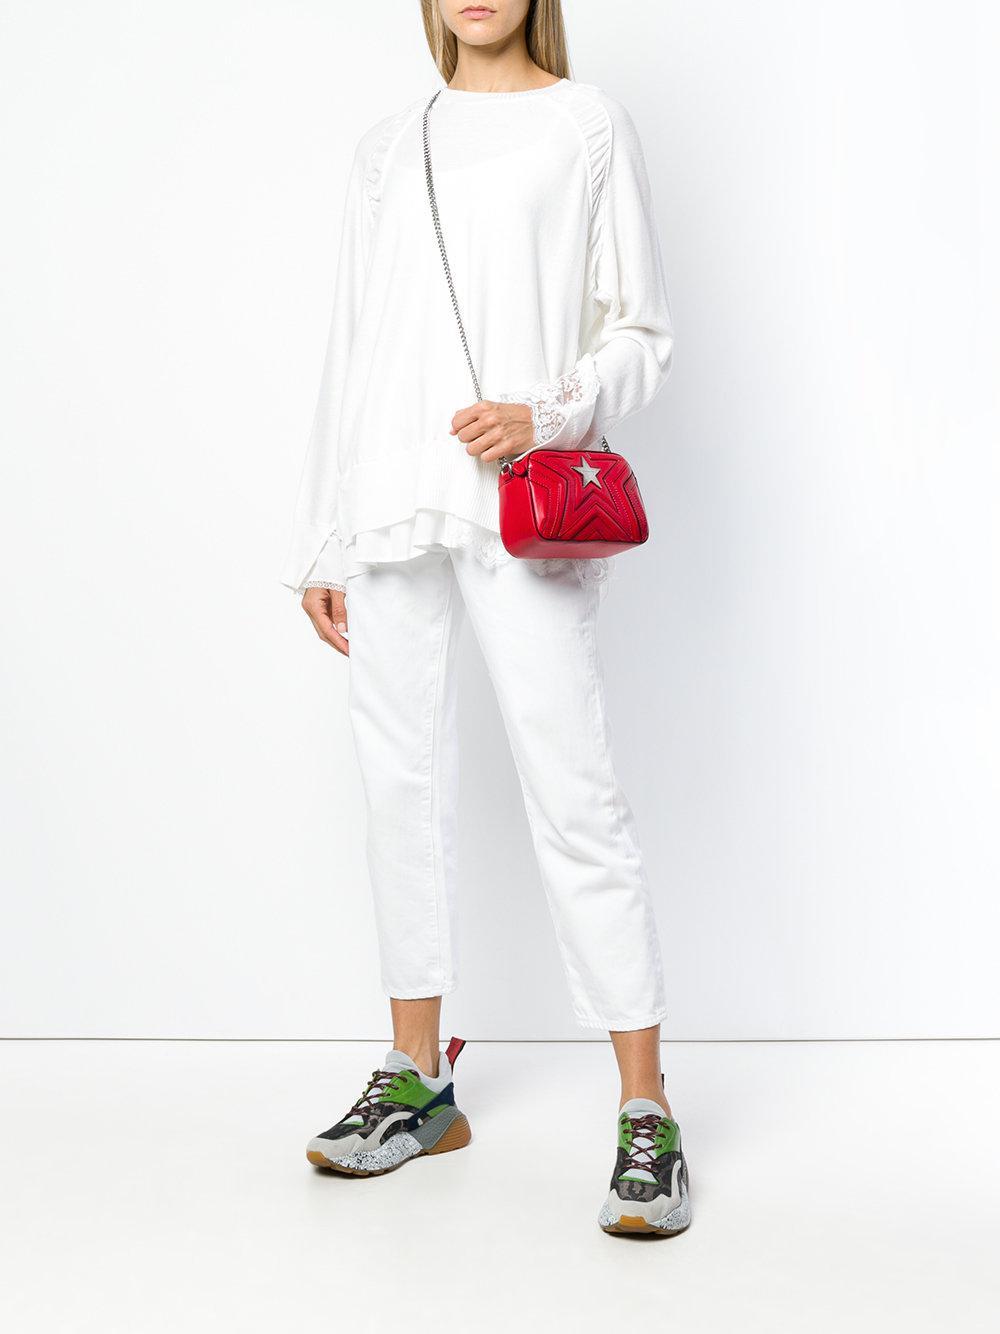 Lyst - Stella McCartney Star Cross Body Bag in Red - Save 40% 955f80925a429